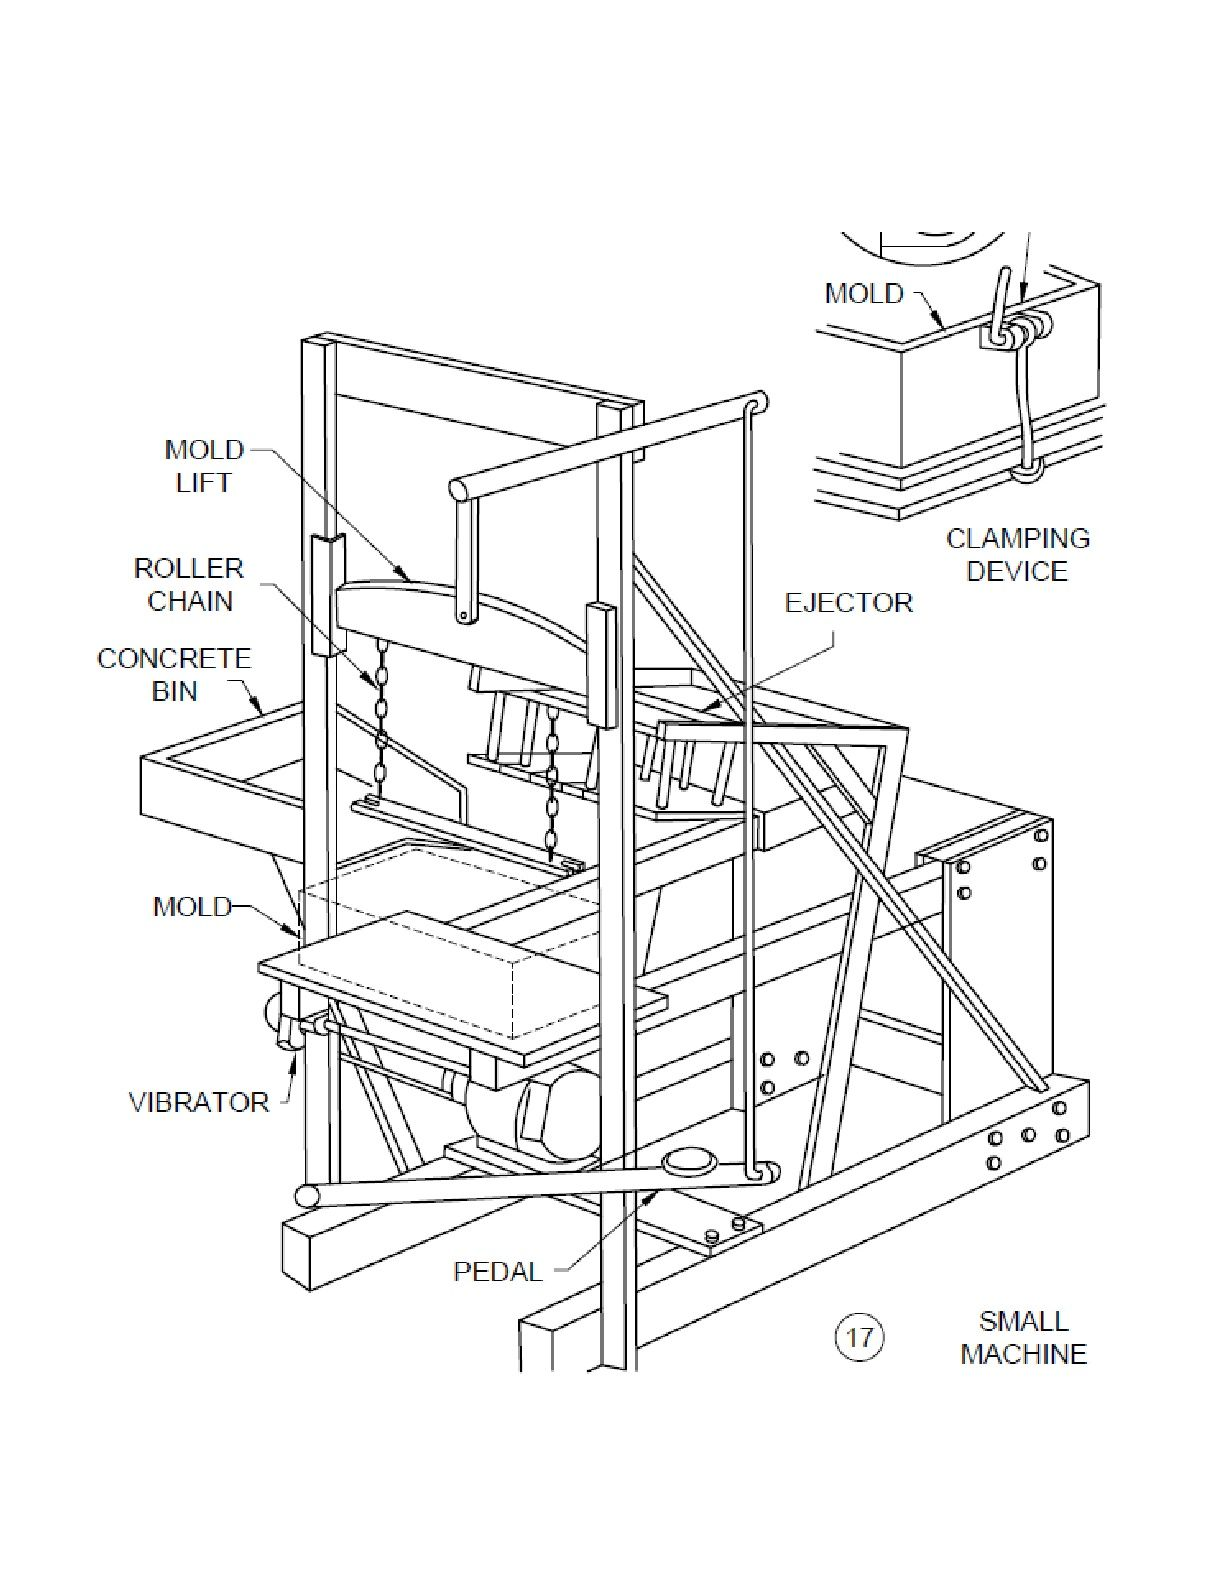 hight resolution of concrete block making machine plans diy cinder brick maker 100 blocks an hour